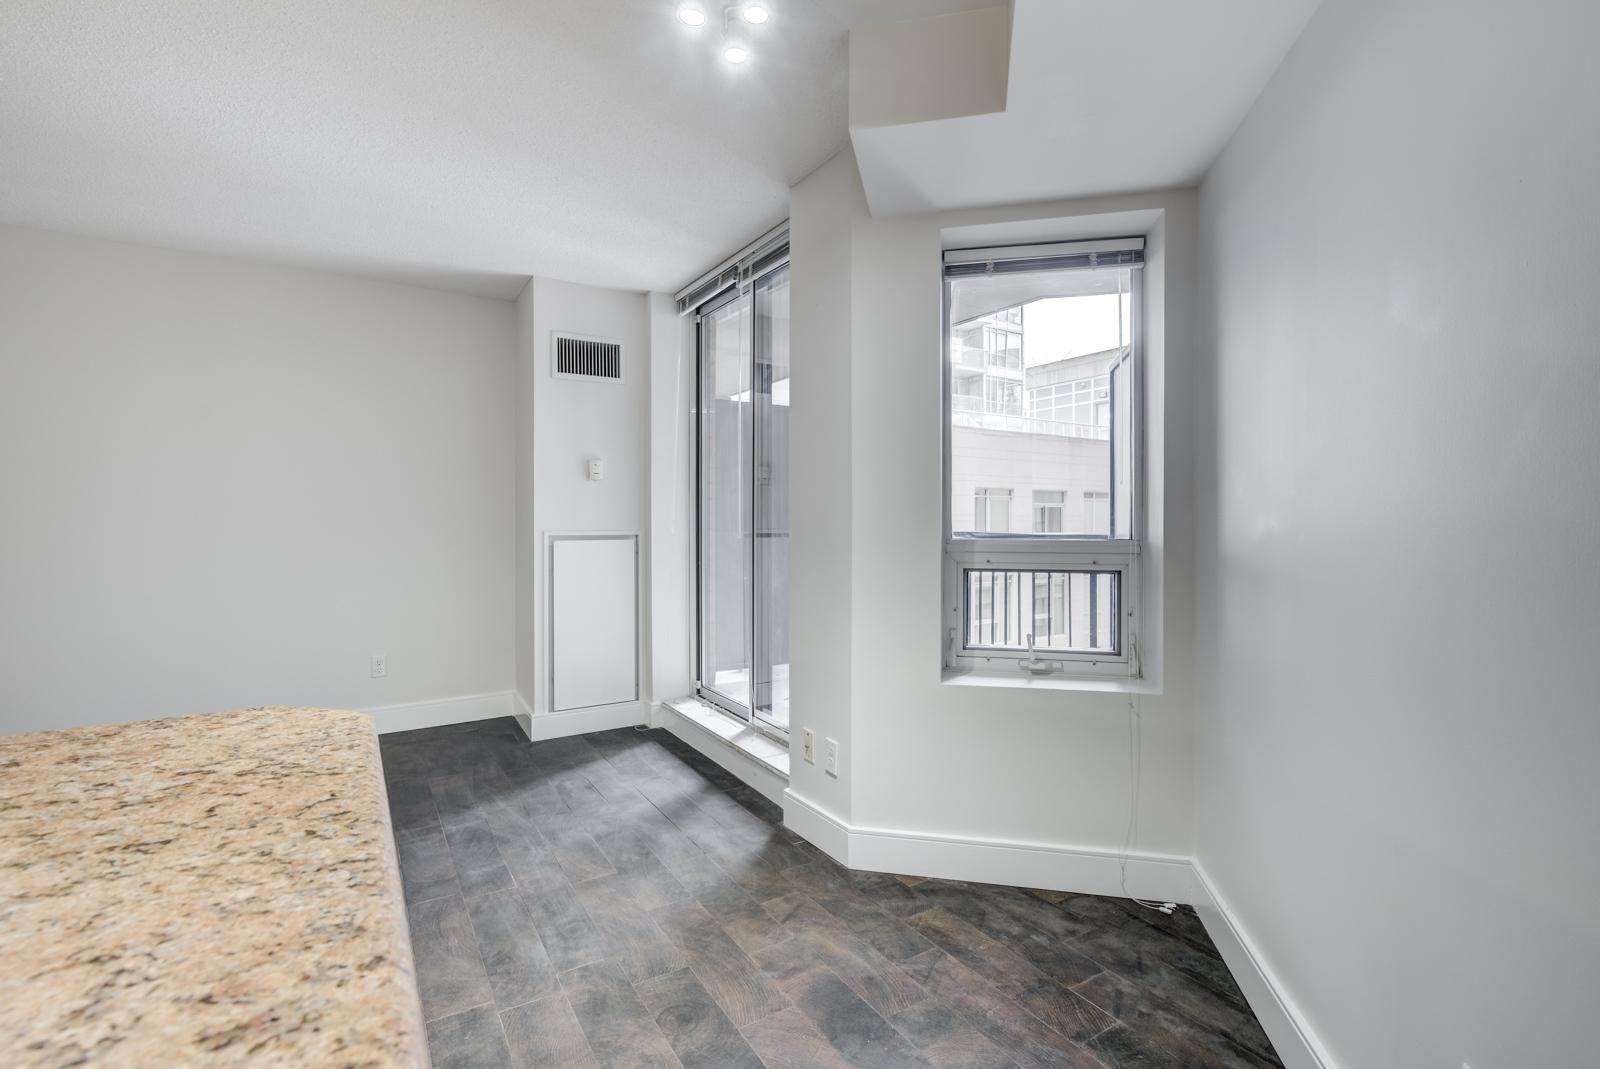 Gray wall with window.